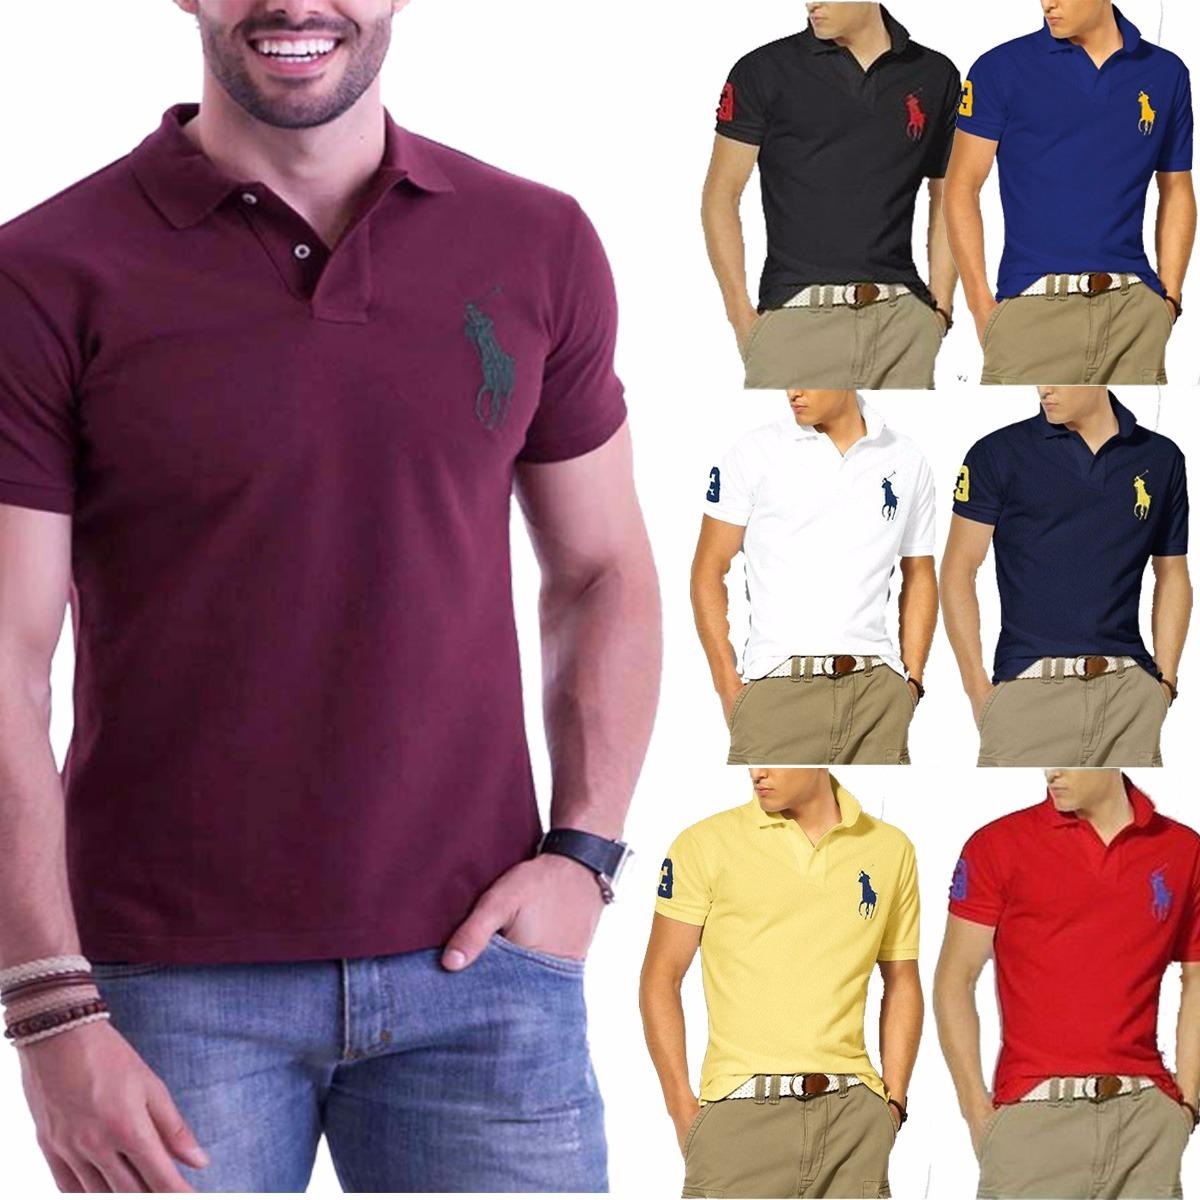 Kit 6 Camisas Camisetas Gola Polo Masculina Grandes Marcas - R  125 ... 23efea37c29d0